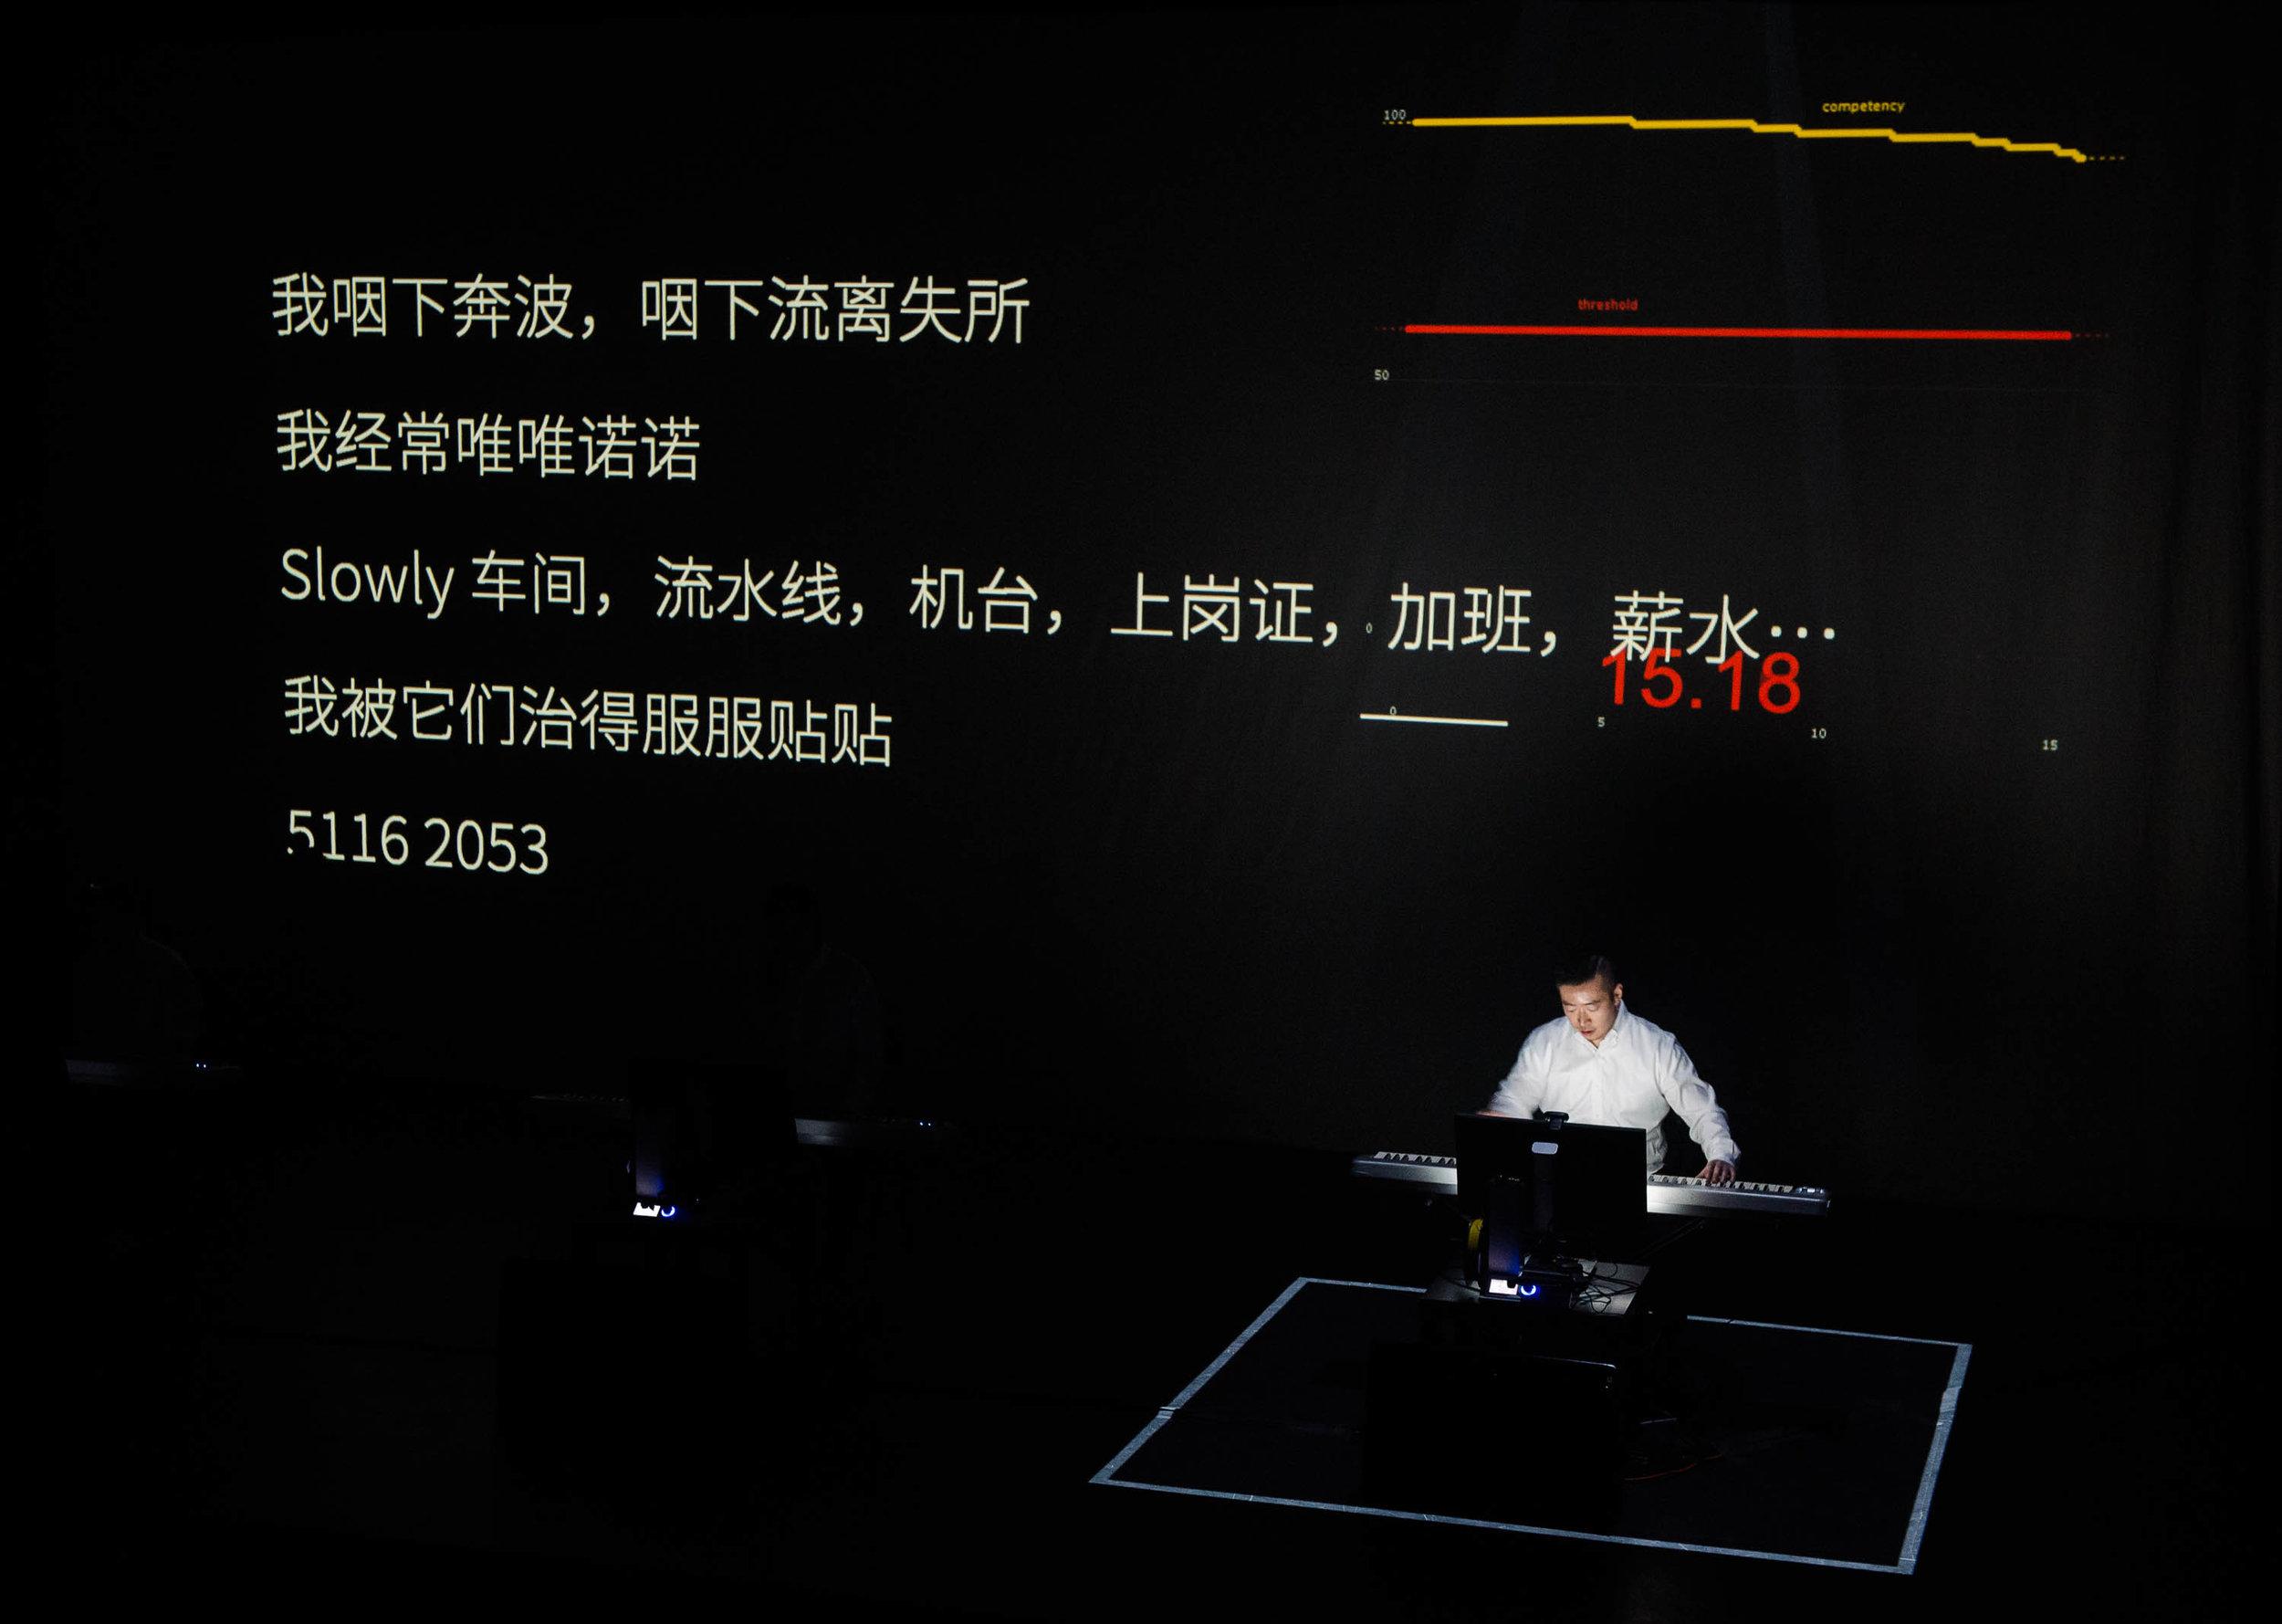 Music Gallery - Hong Kong Exile (Feb22.19)-28.jpg